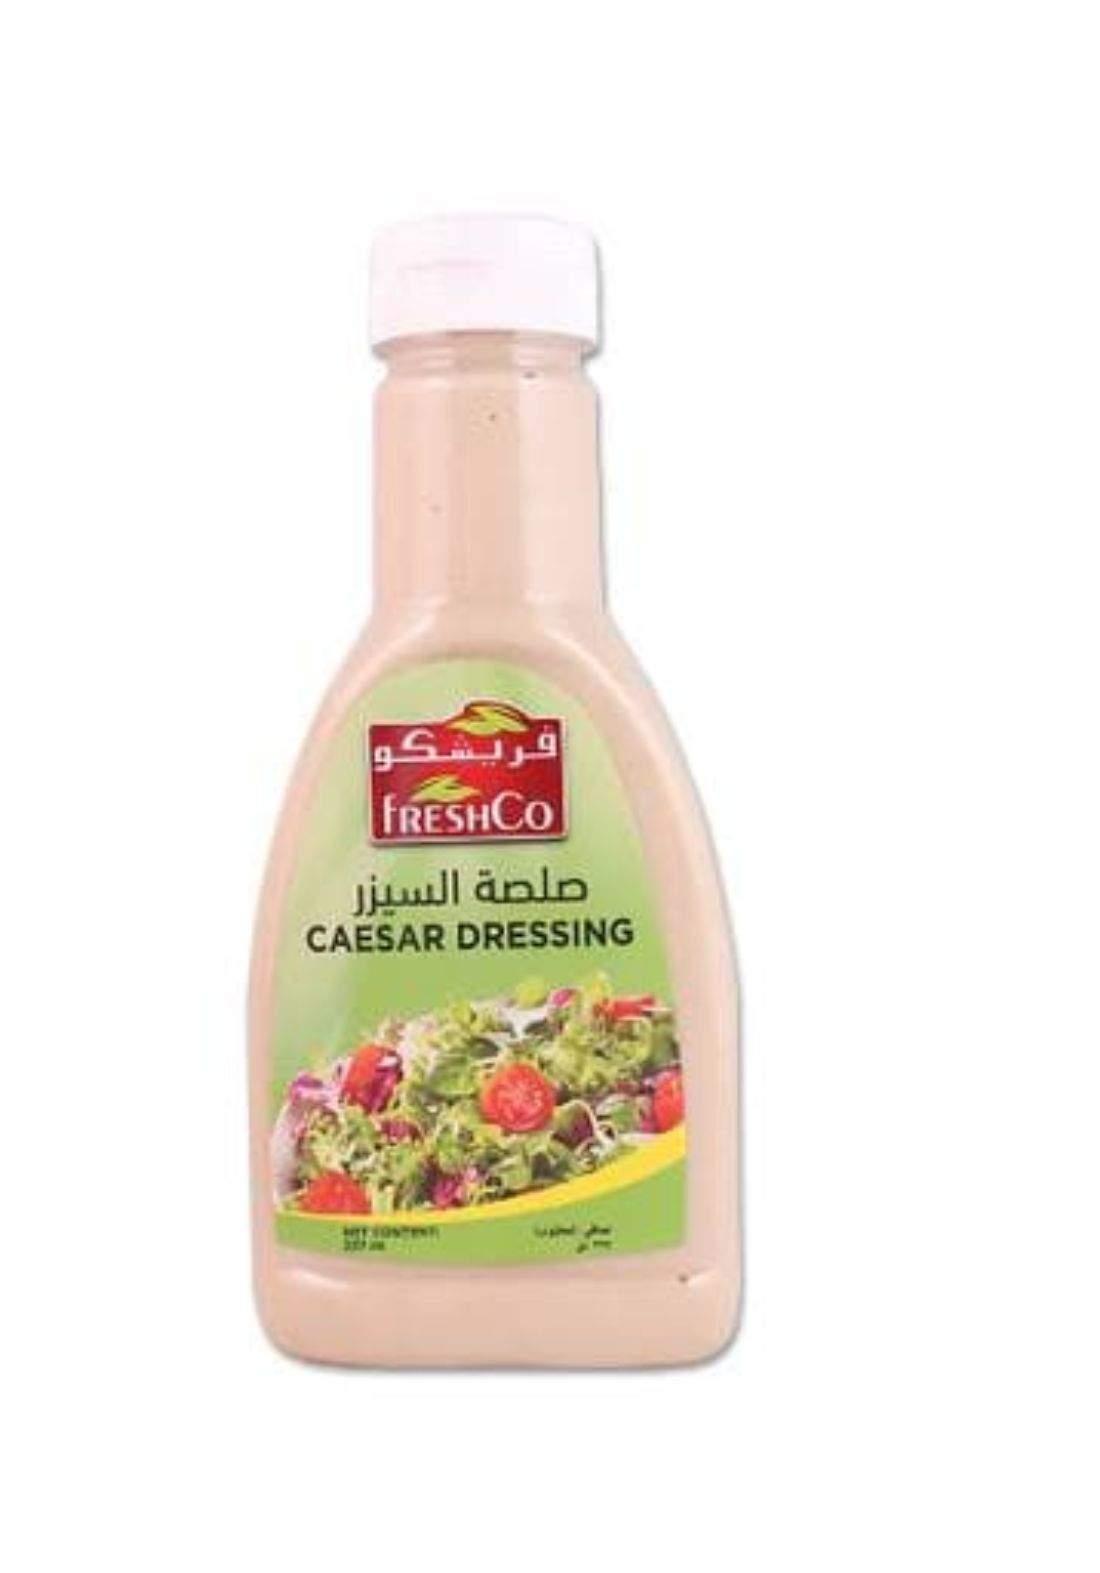 Freshco caesar dressing 237ml فريشكو صلصة السيزر